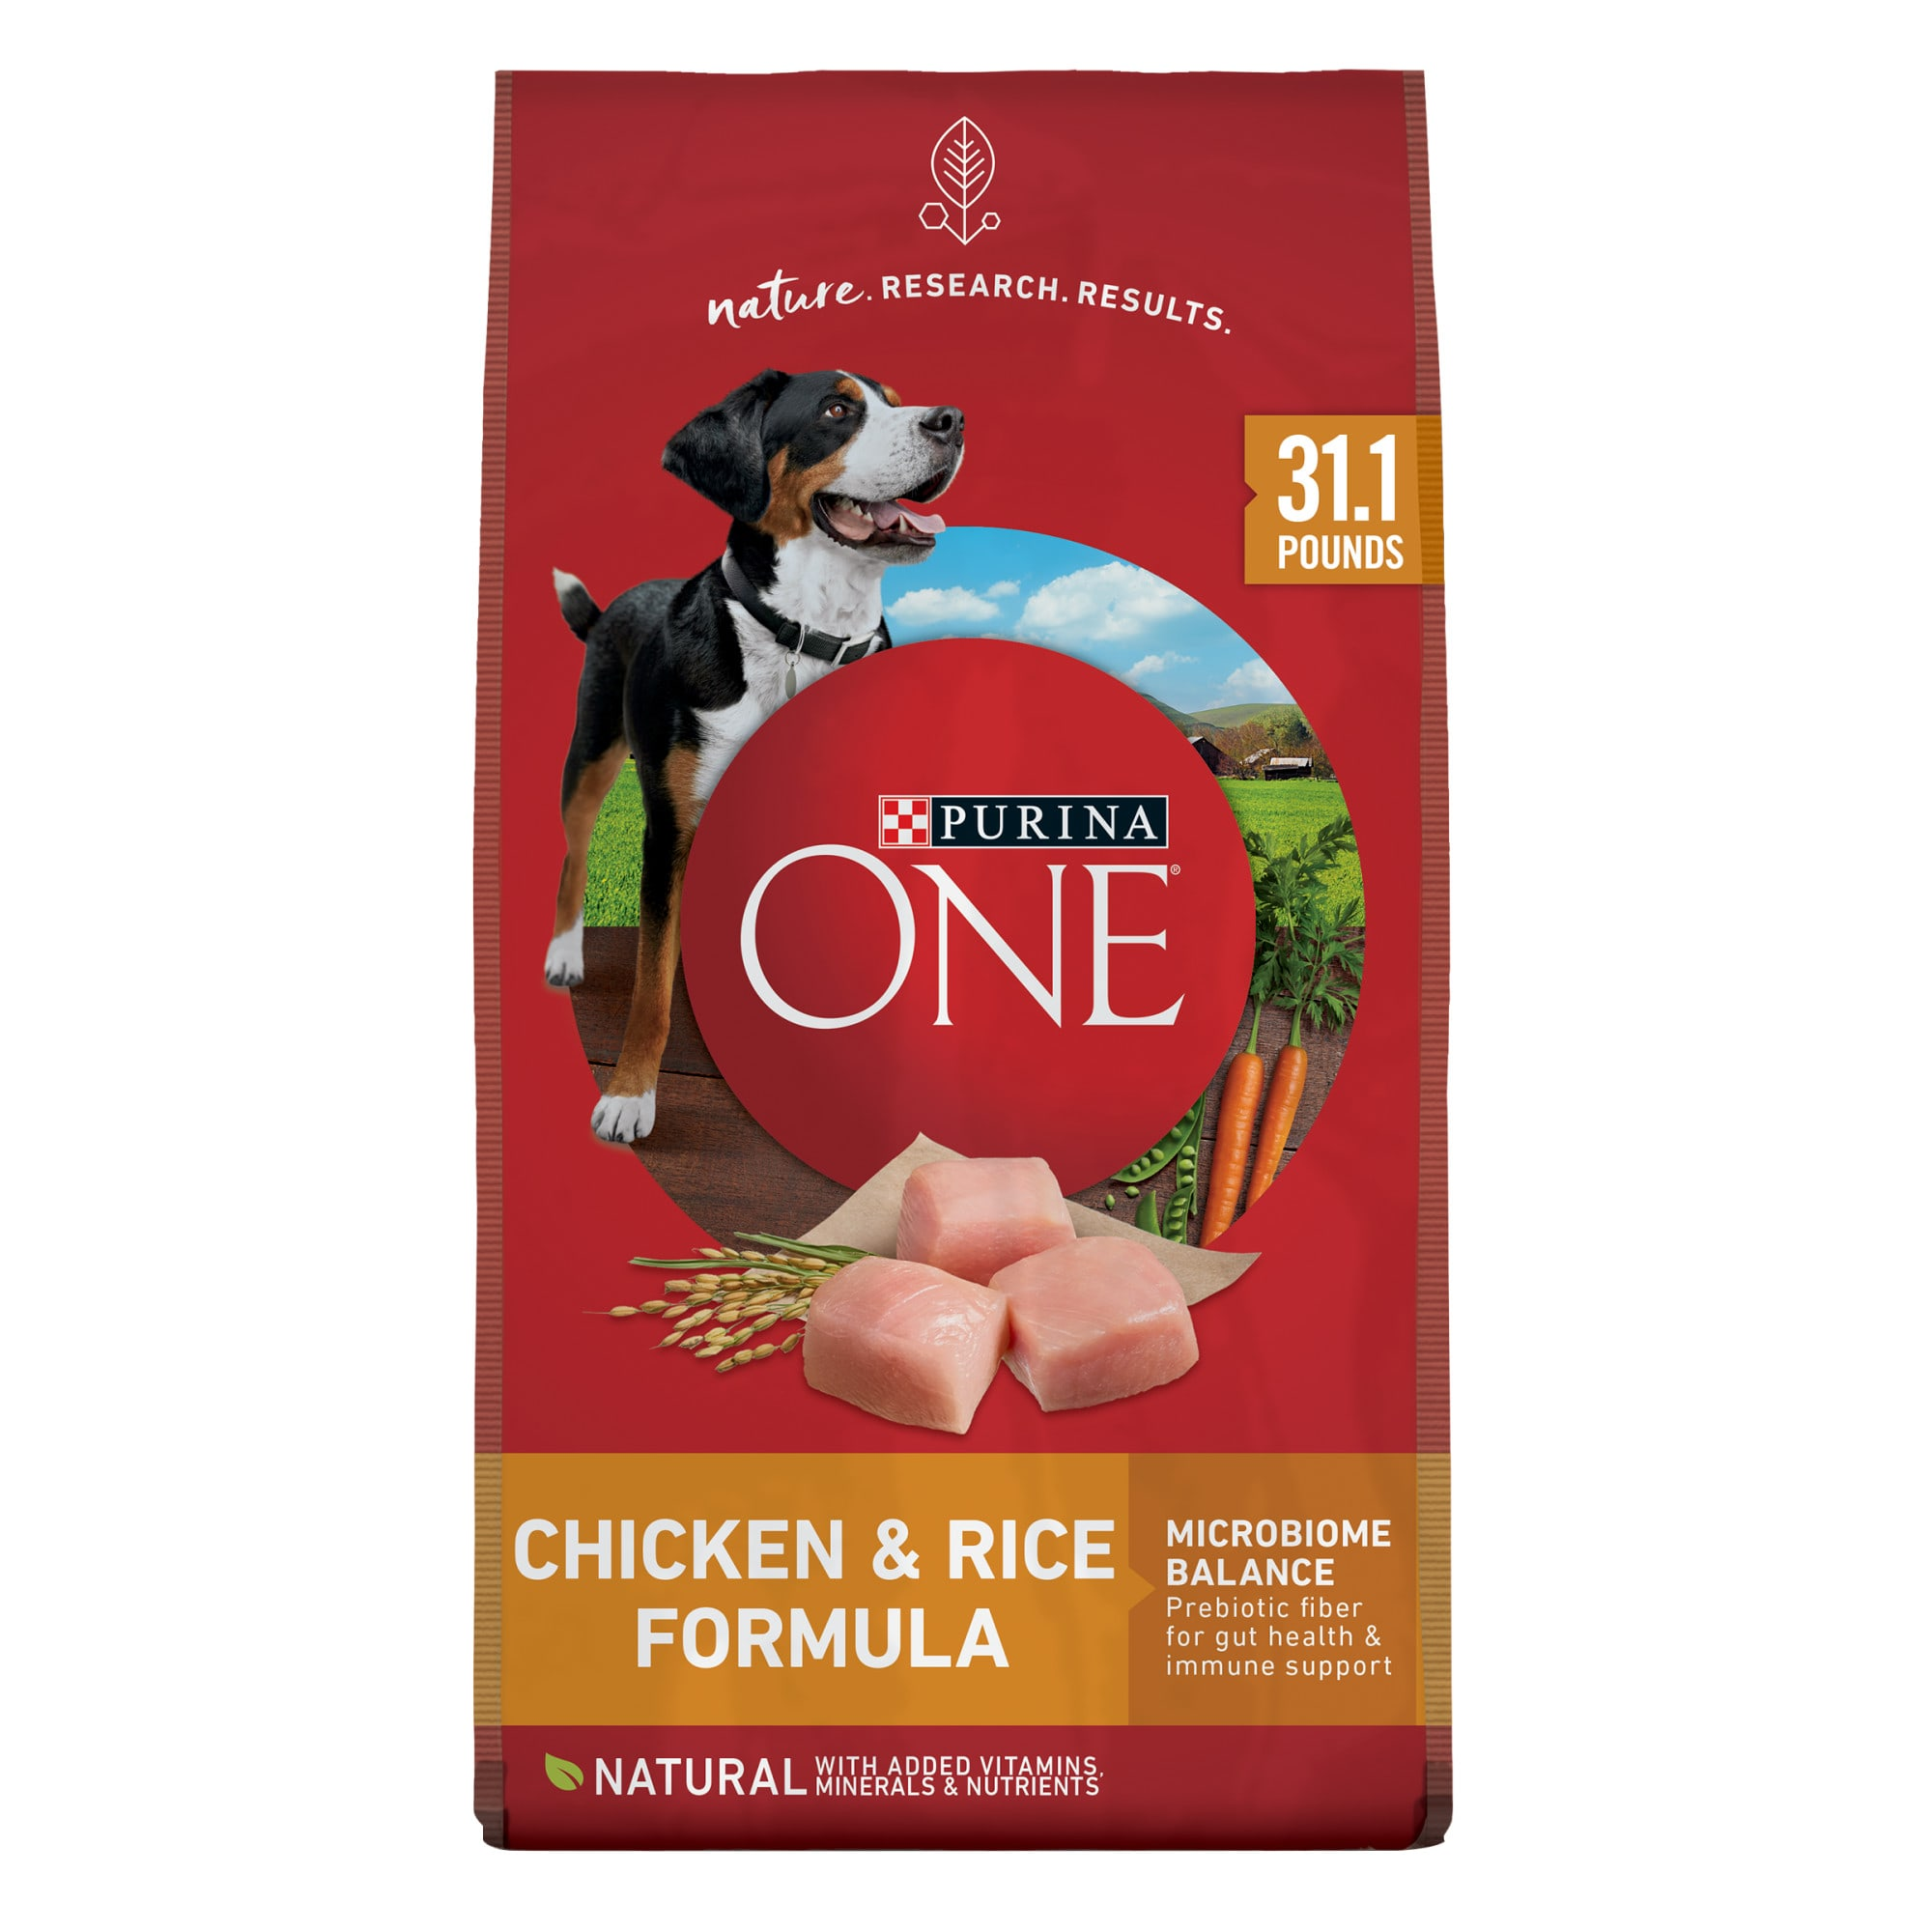 Purina One Smartblend Natural Chicken Rice Formula Dry Dog Food 31 1 Lbs Bag Petco